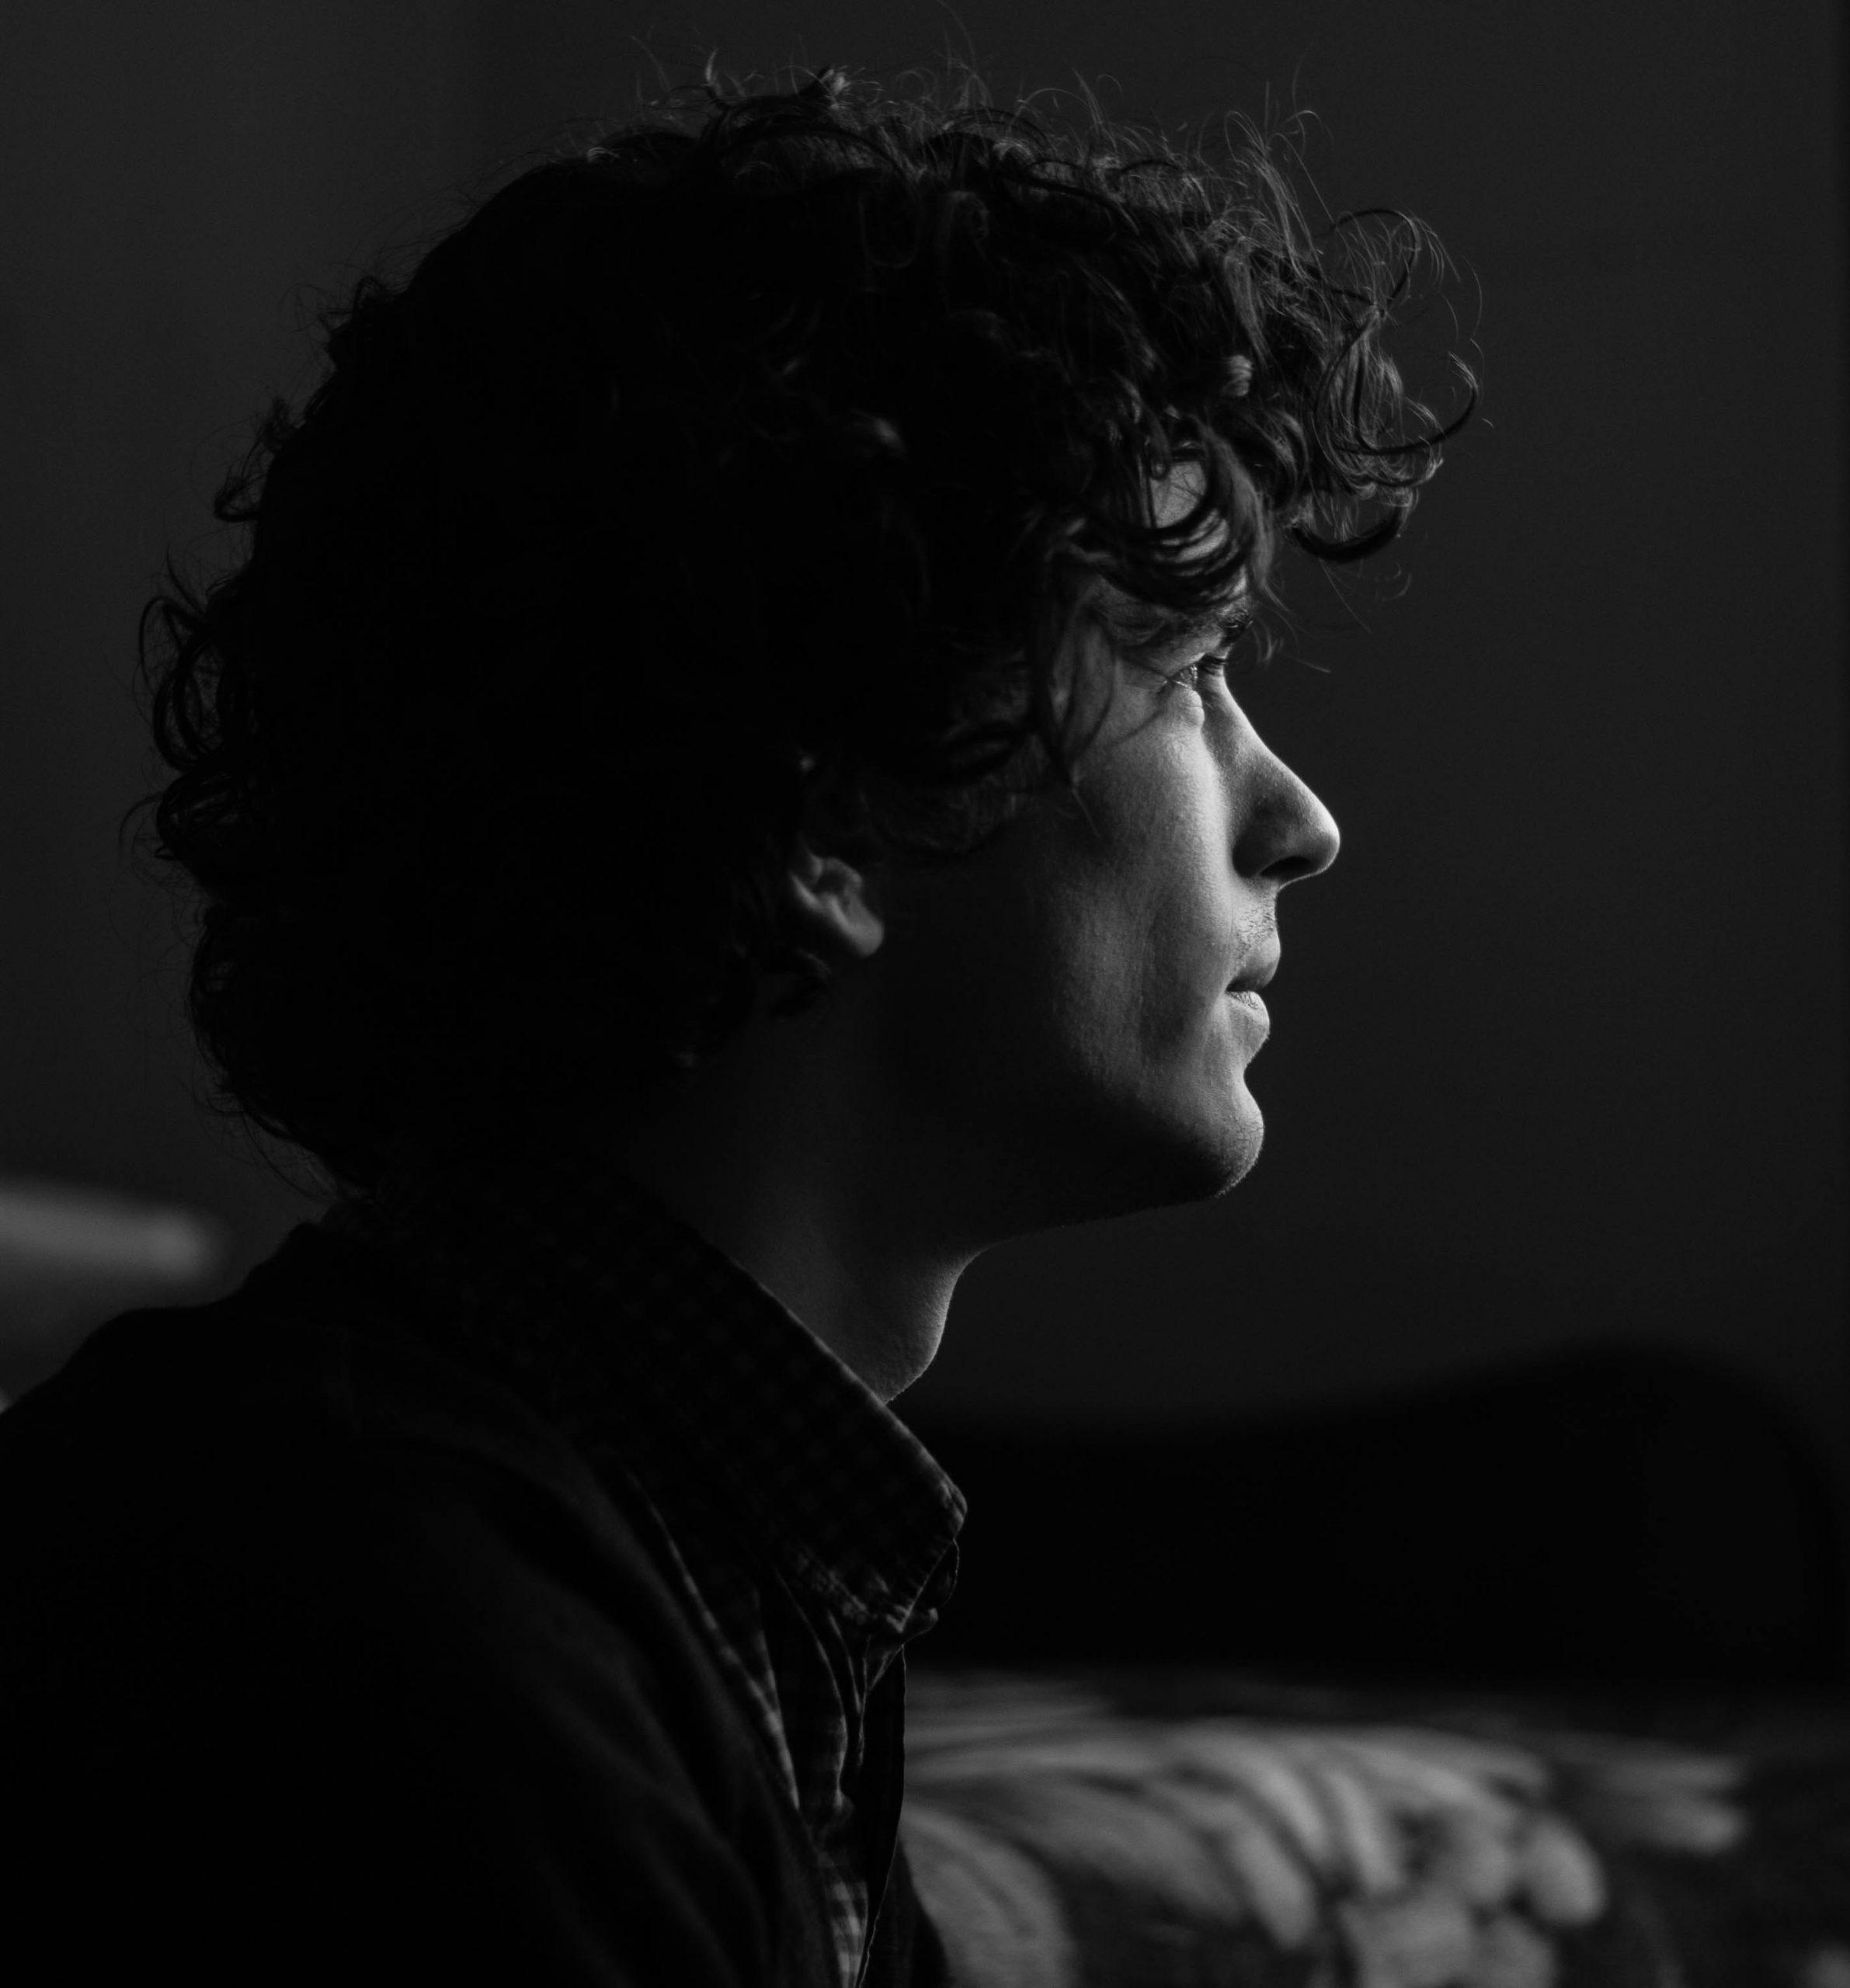 light-black-and-white-portrait-canon-60778-scaled.jpg